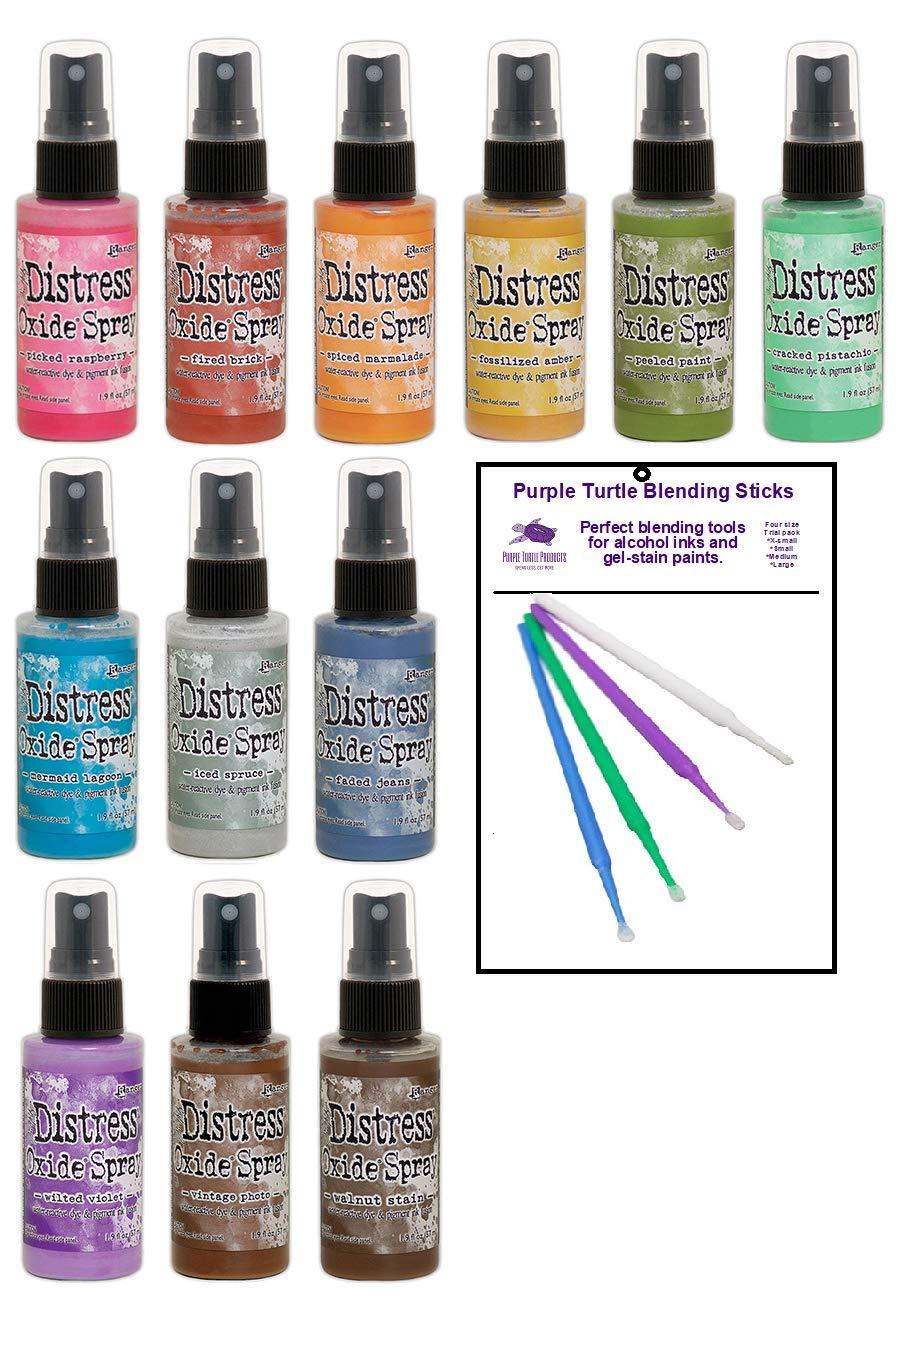 Tim Holtz Distress Oxide Spray Bundle New 2019 Colors (12 Bottle Set) by Purple Turtle Products